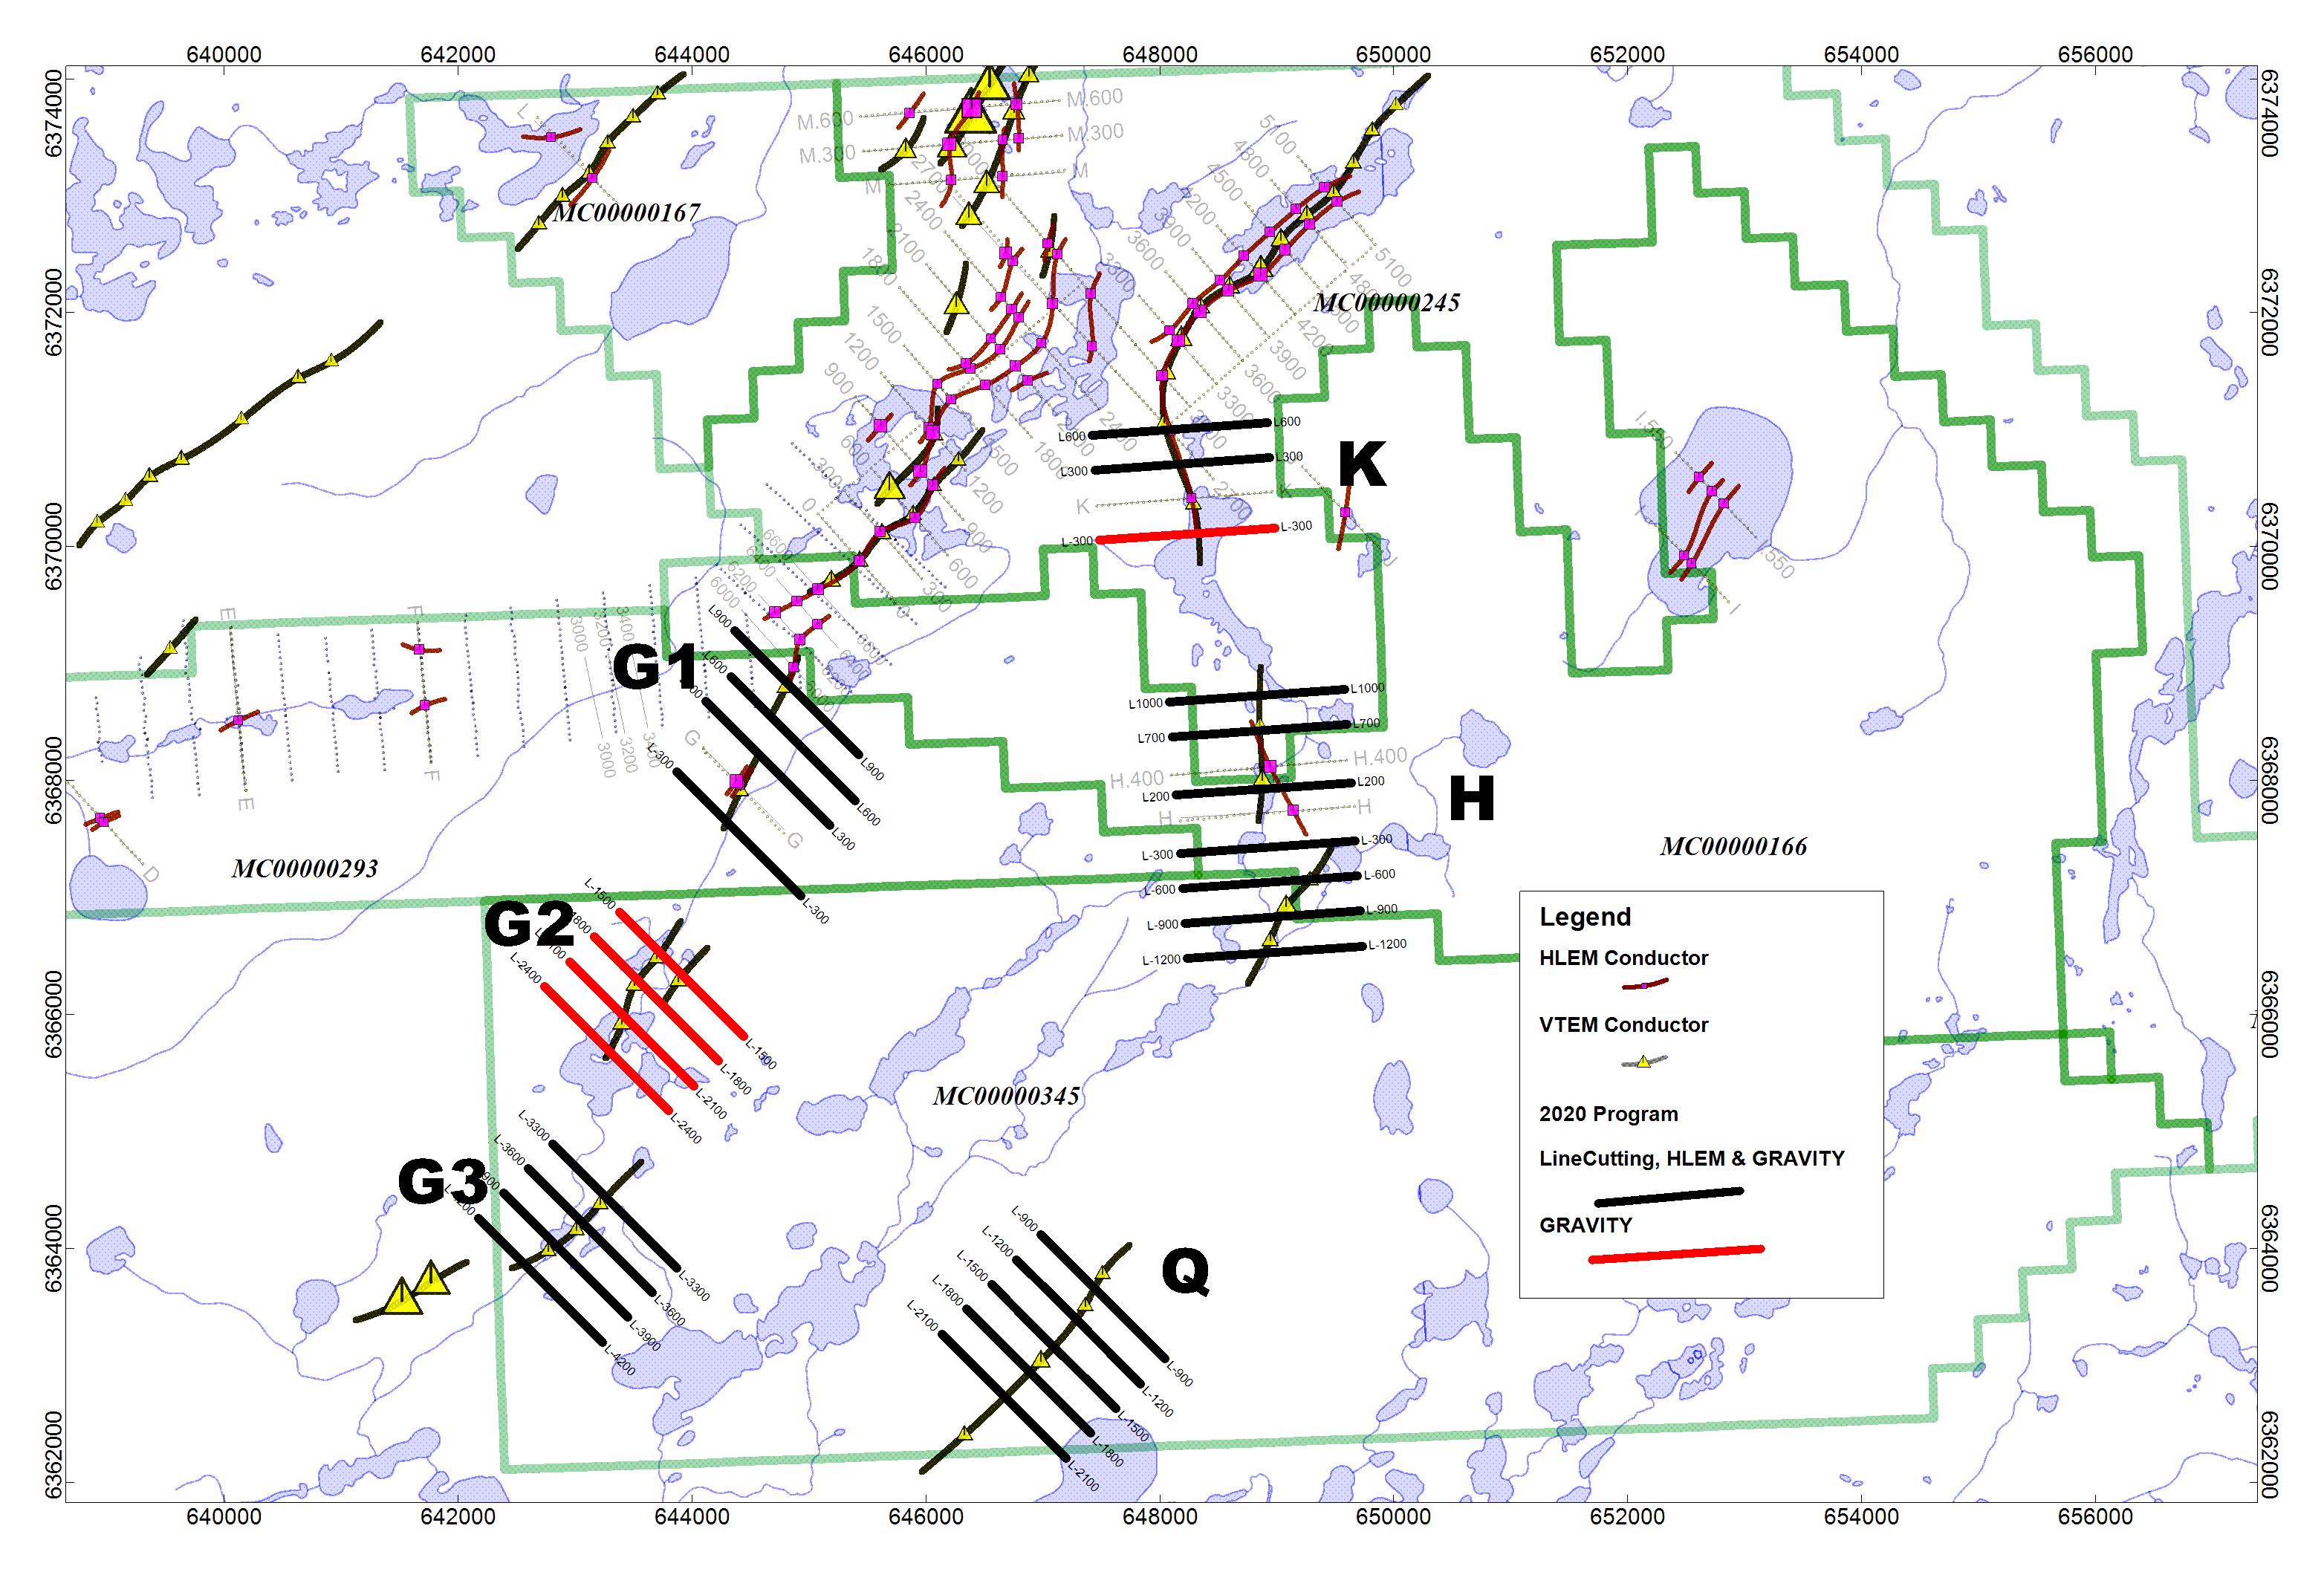 Figure 1 – East Preston Summer Geophysical Program Location Map